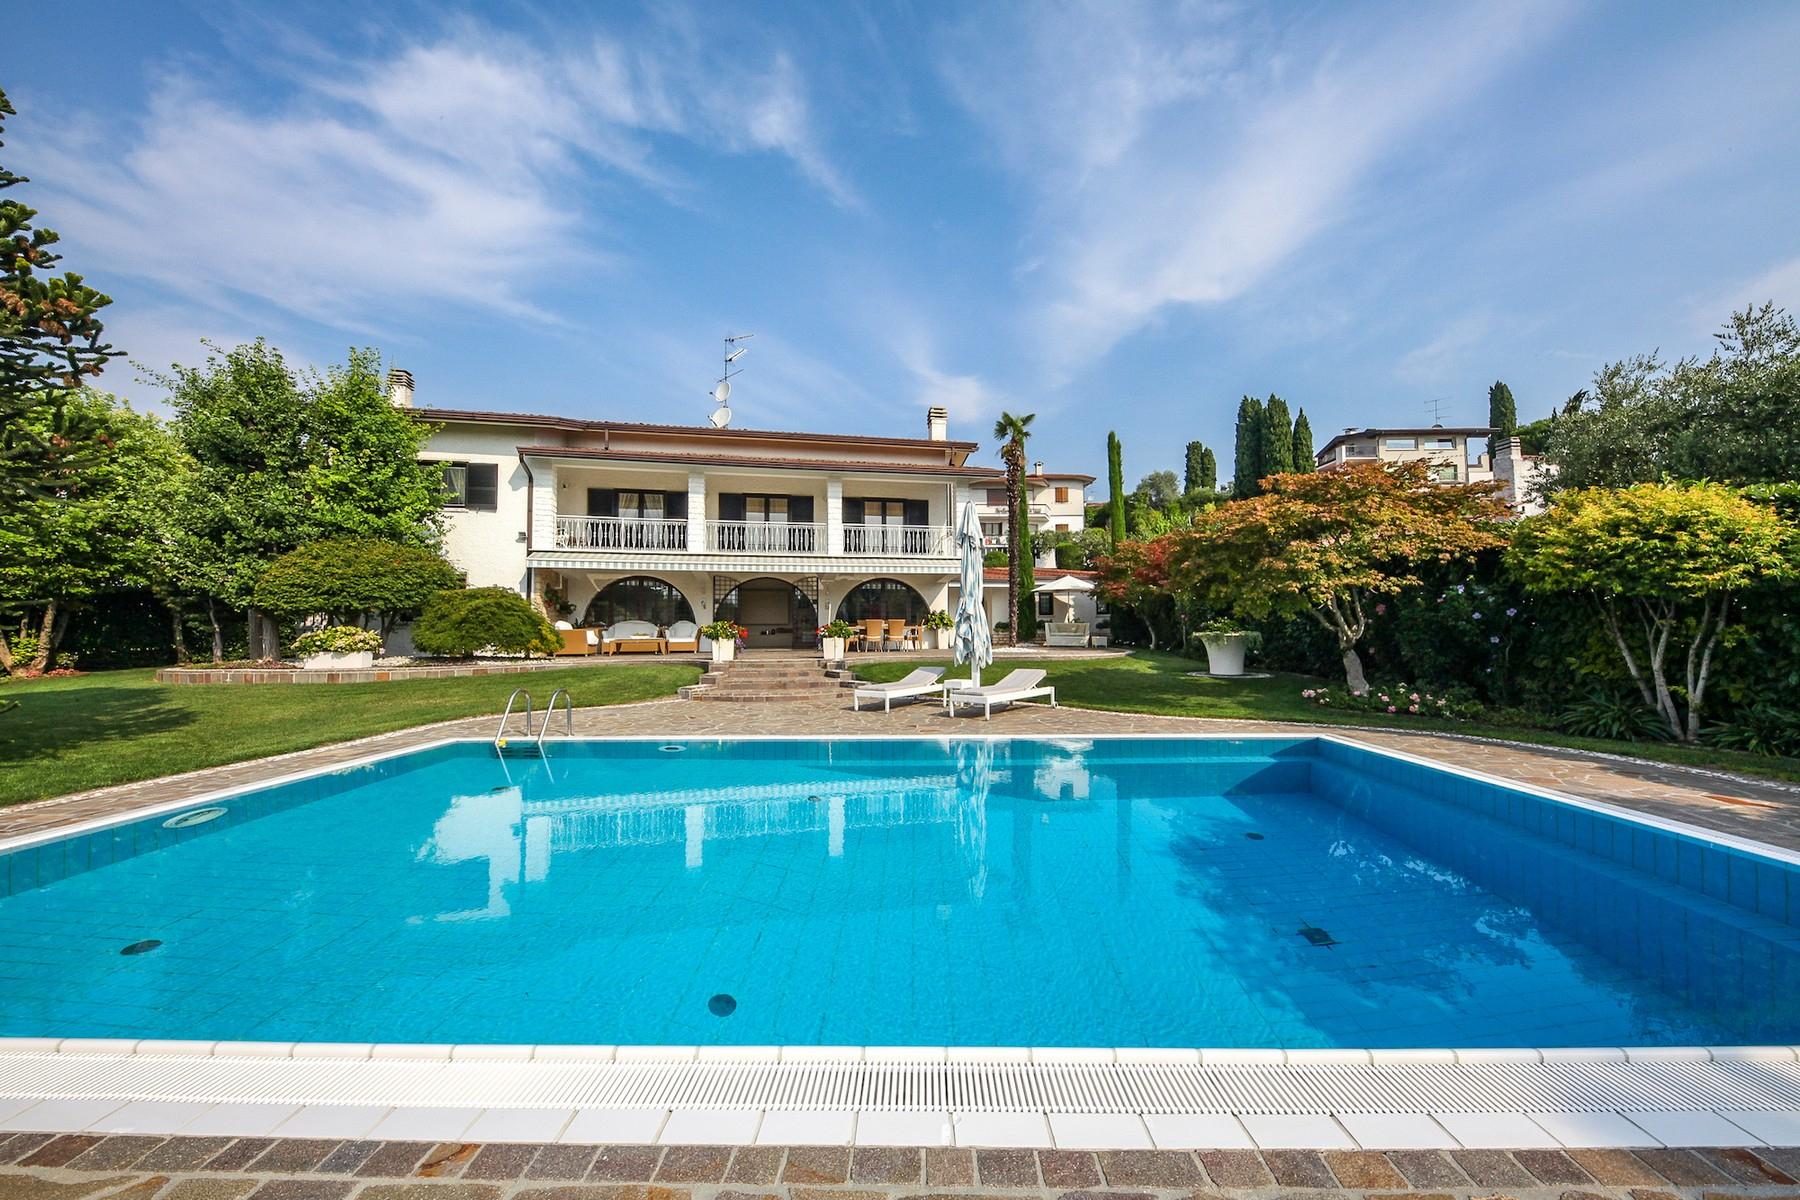 Villa in Vendita a Padenghe Sul Garda: 5 locali, 330 mq - Foto 15